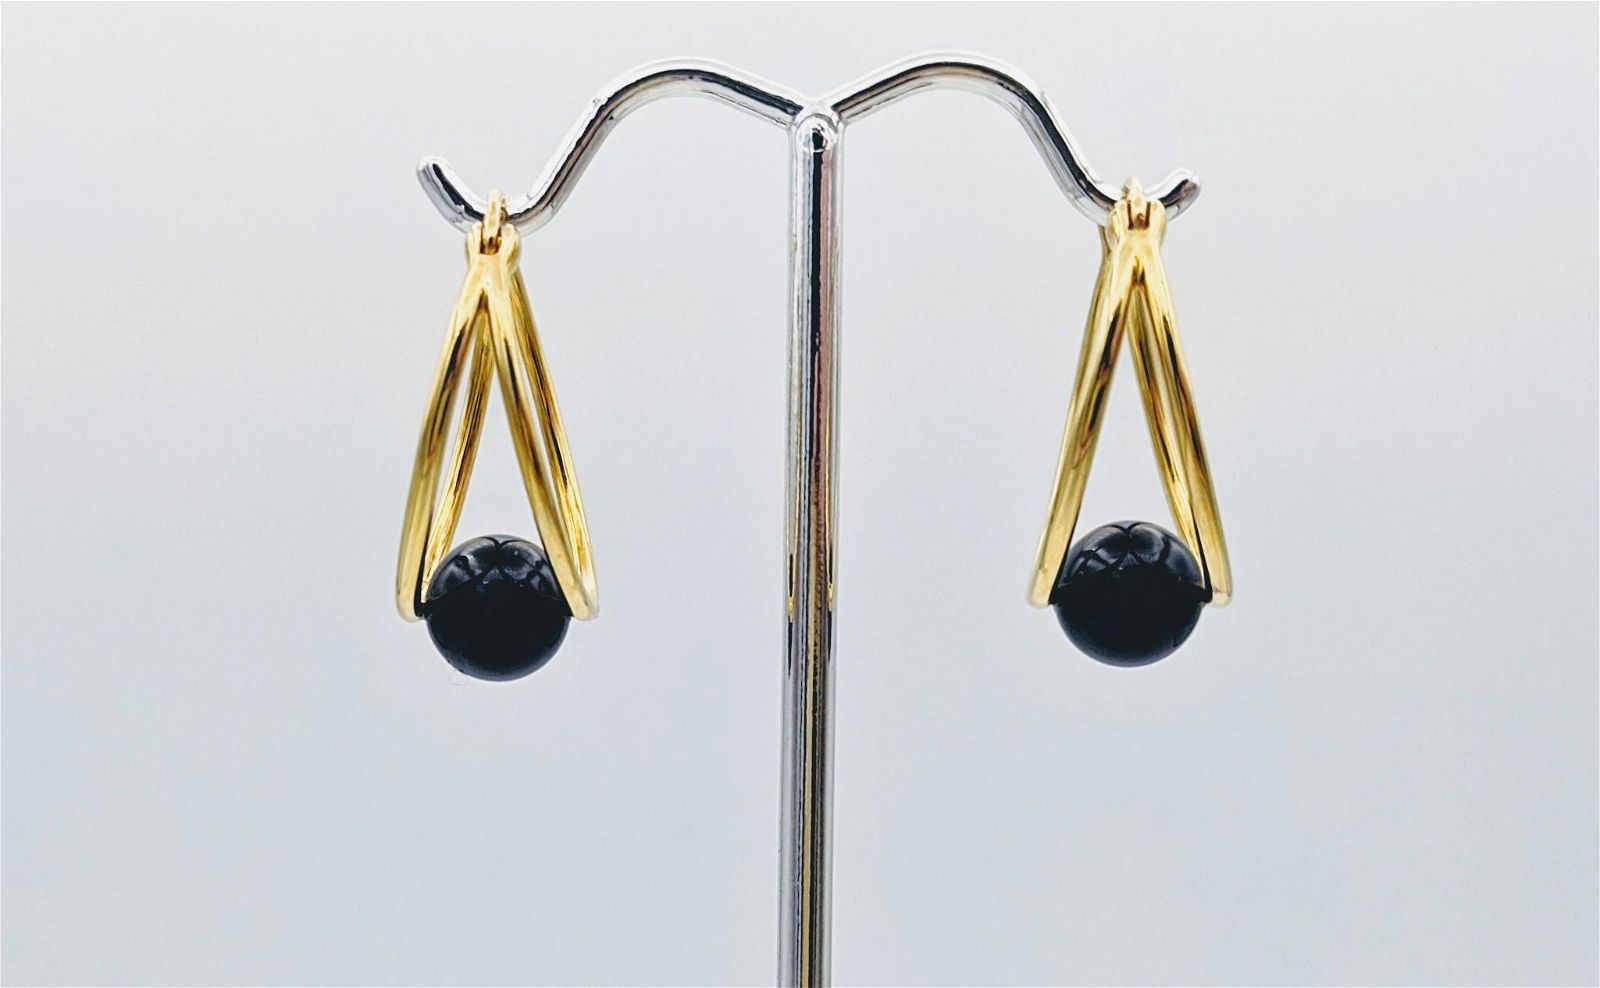 Gold Plated Oval Hoop Earrings w Black Onyx